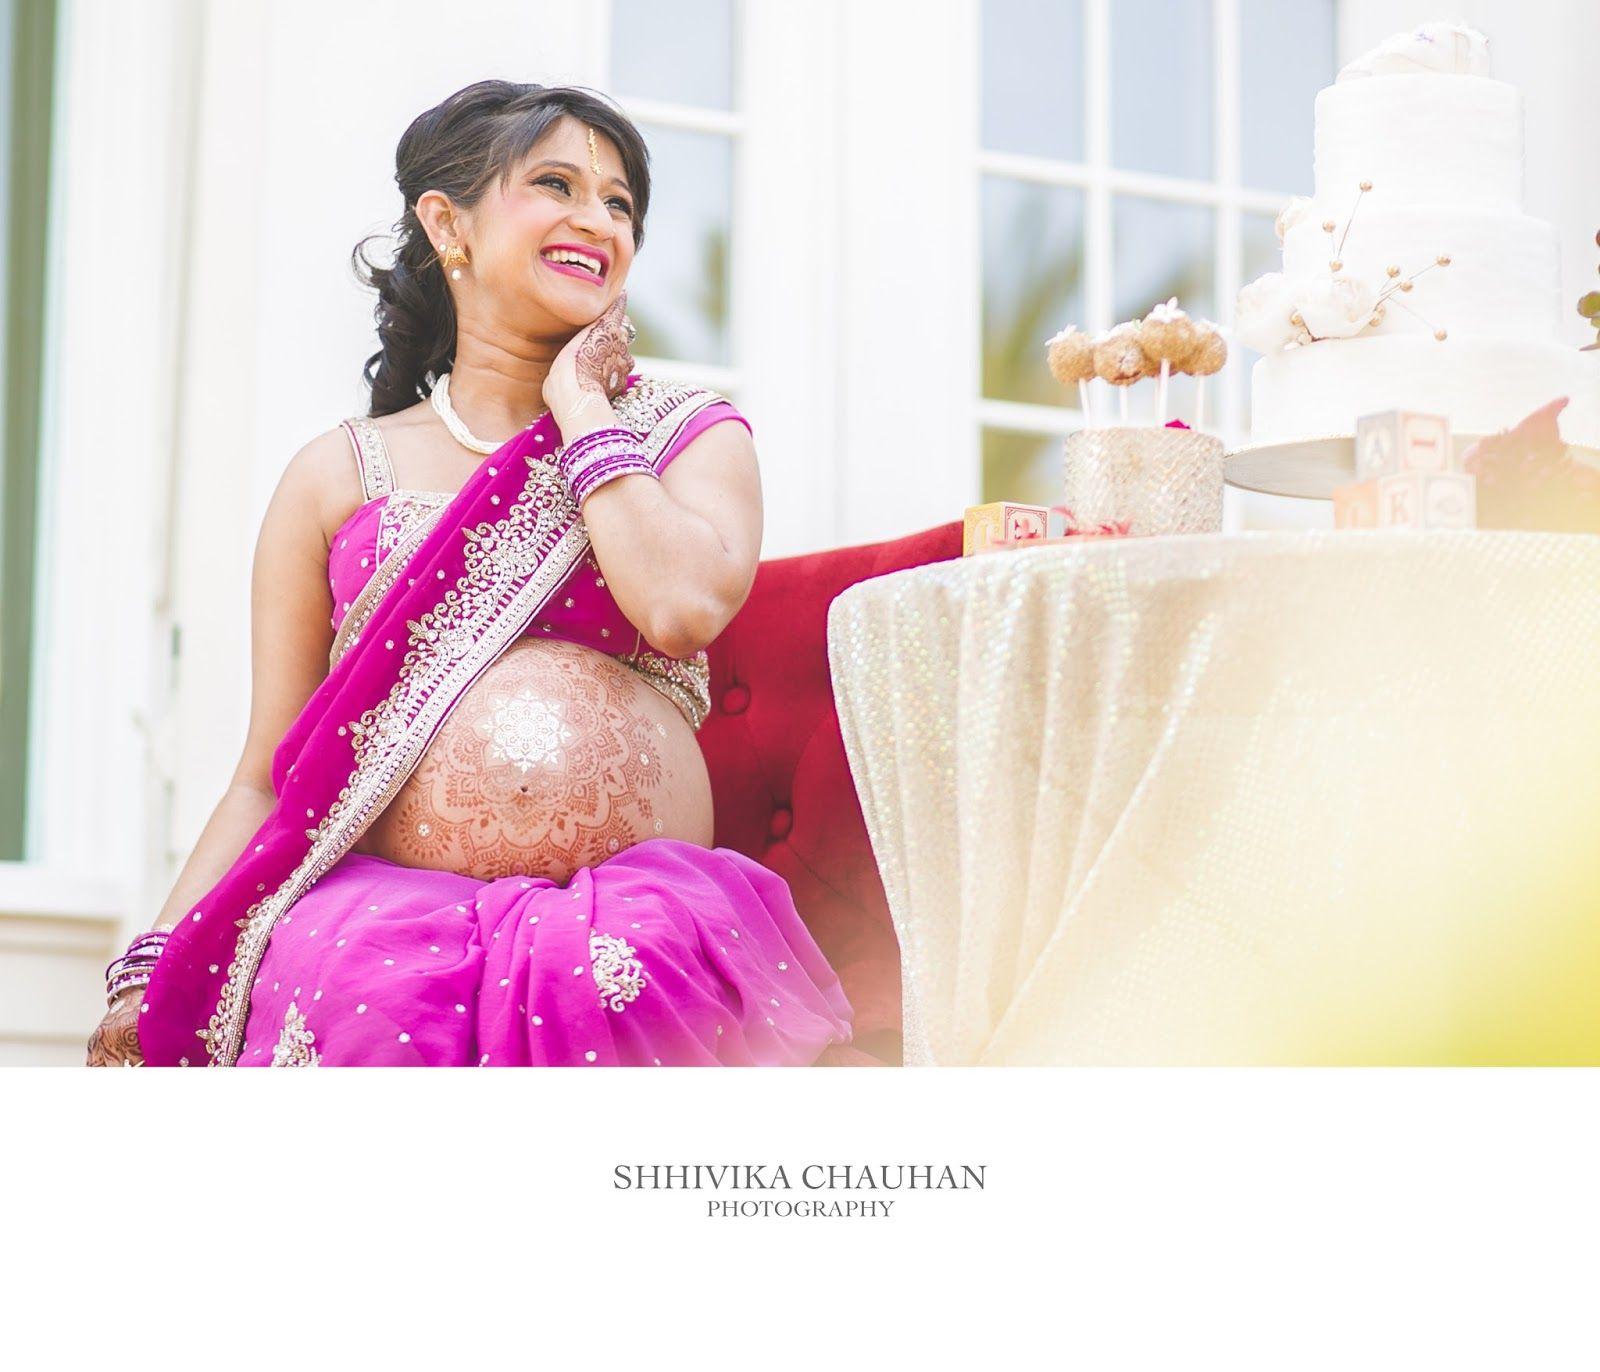 Pin by sarisisters on pregnant in saree pregnancy indian fashion searching photoshoot maternity google saree india fashion sari ombrellifo Choice Image